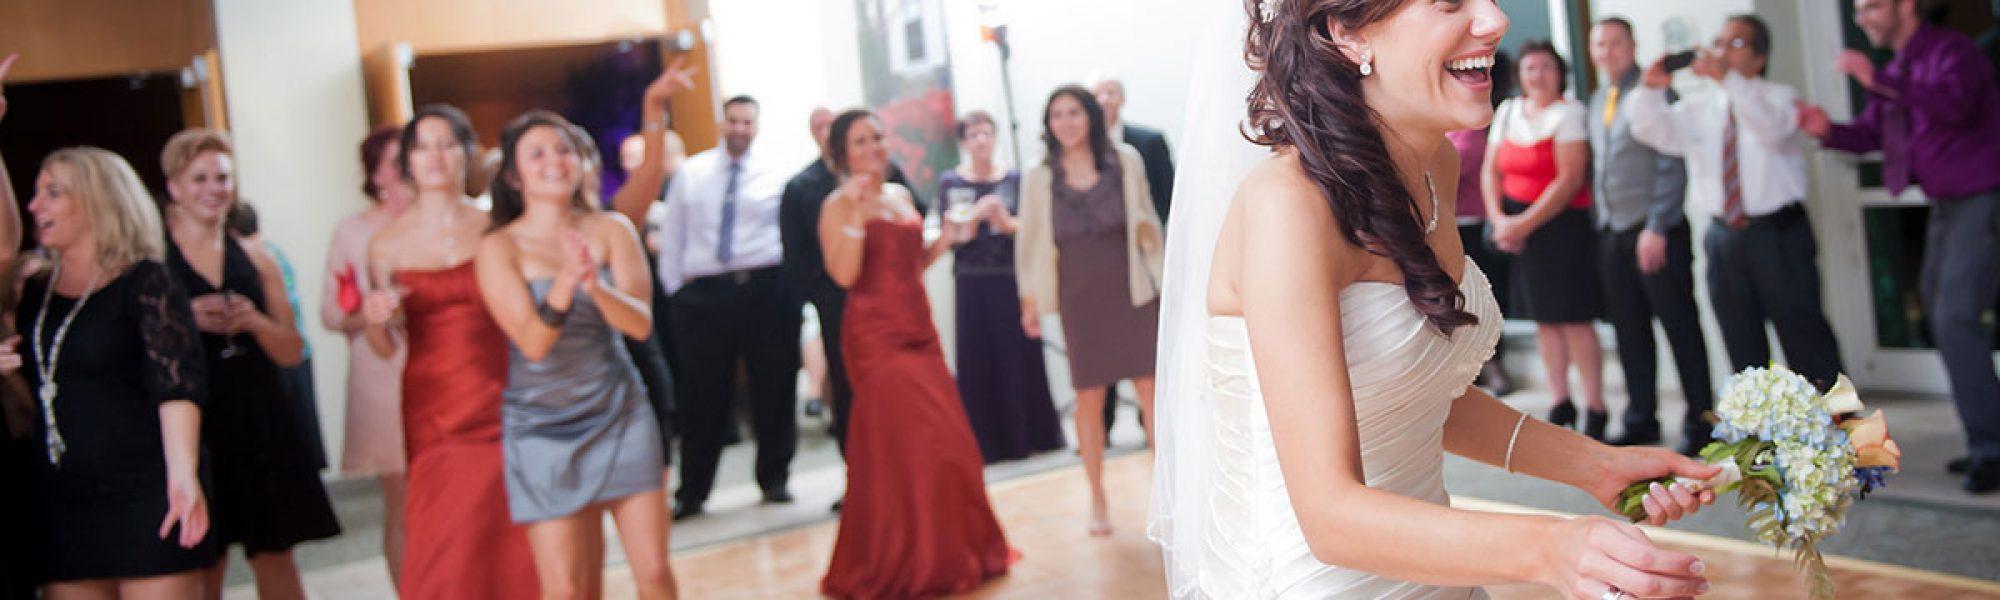 bride-throwing-bouquet-reminisce